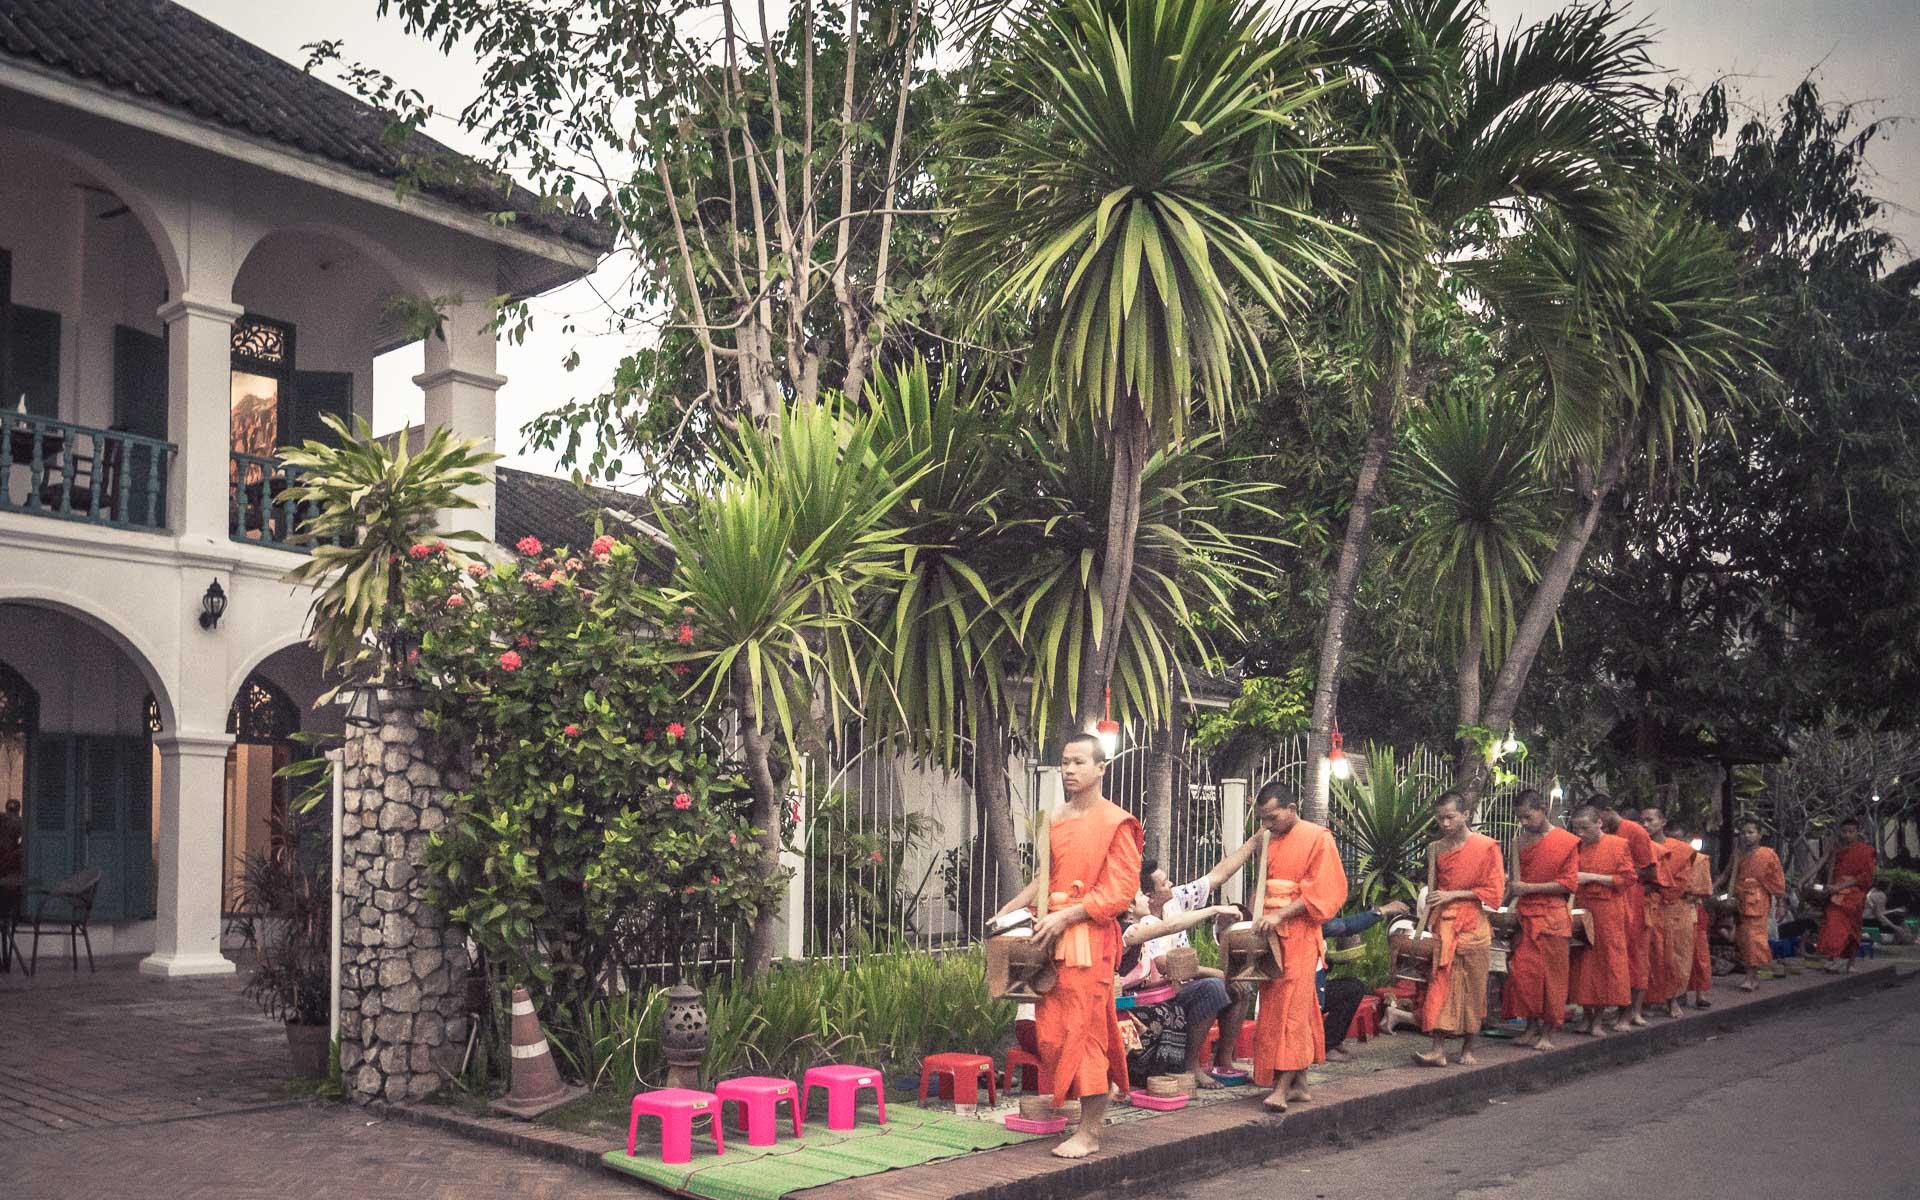 Lesvoyageuses-voyage-laos-luang-prabang-ceremonie-offrandes-12